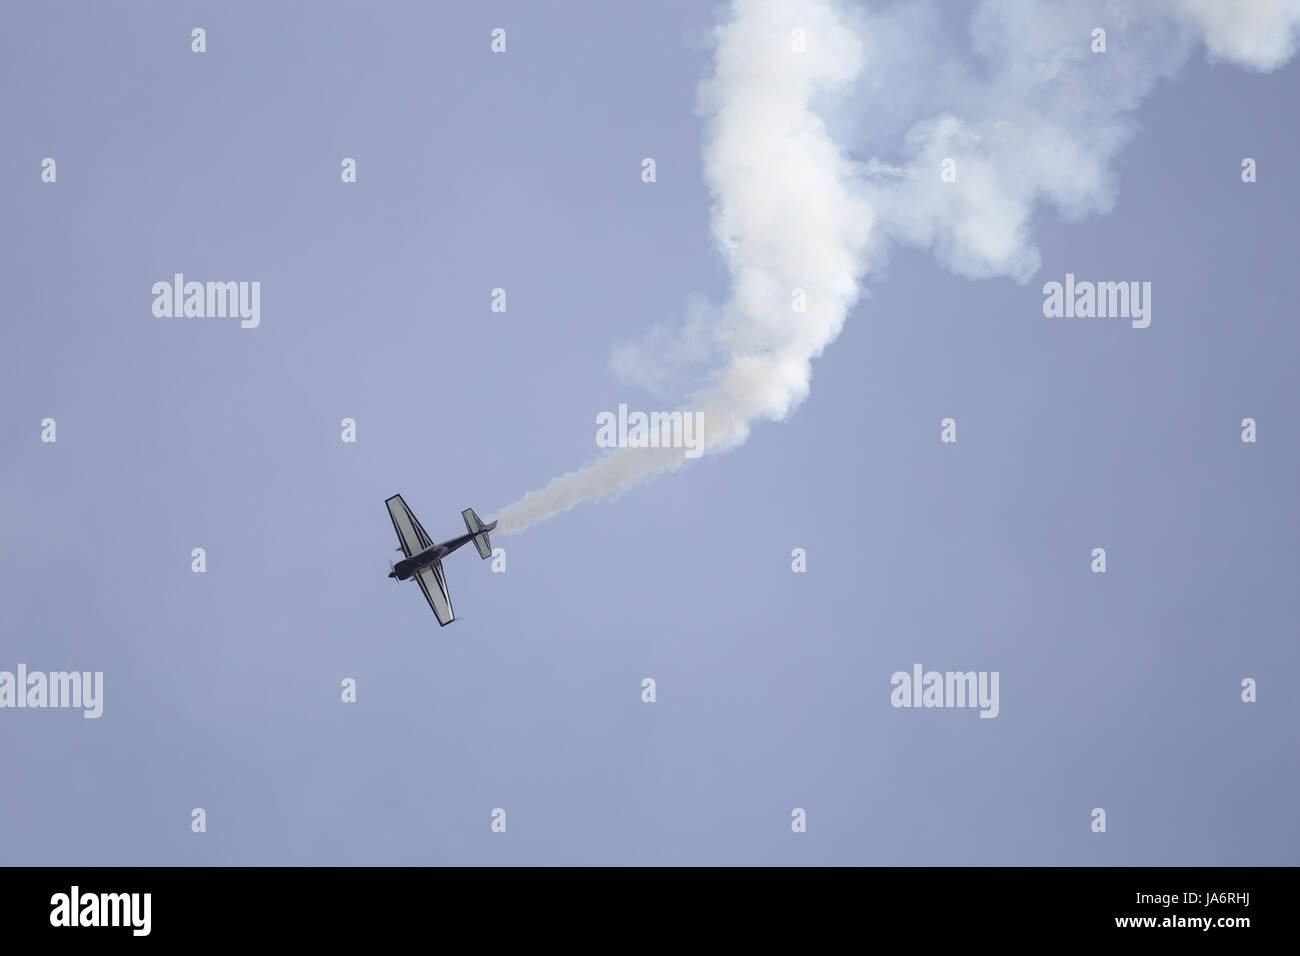 La Ferte Alais, France. 4th June, 2017. A plane performs acrobatics in the skies above the Aerodrome de Cerny, La - Stock Image